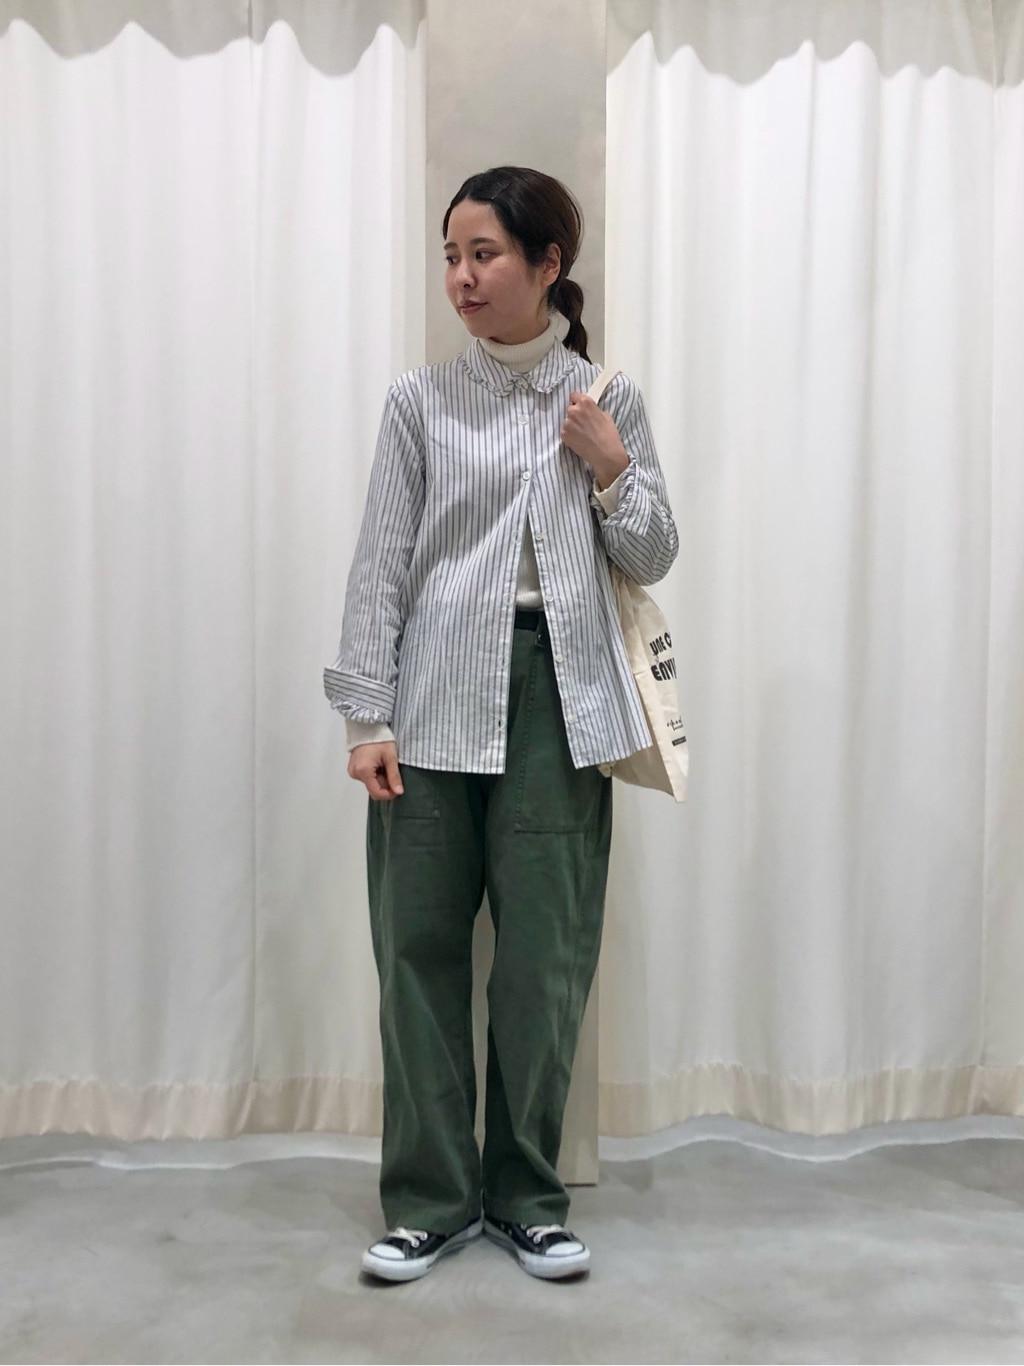 CHILD WOMAN , PAR ICI 東京スカイツリータウン・ソラマチ 2021.01.05